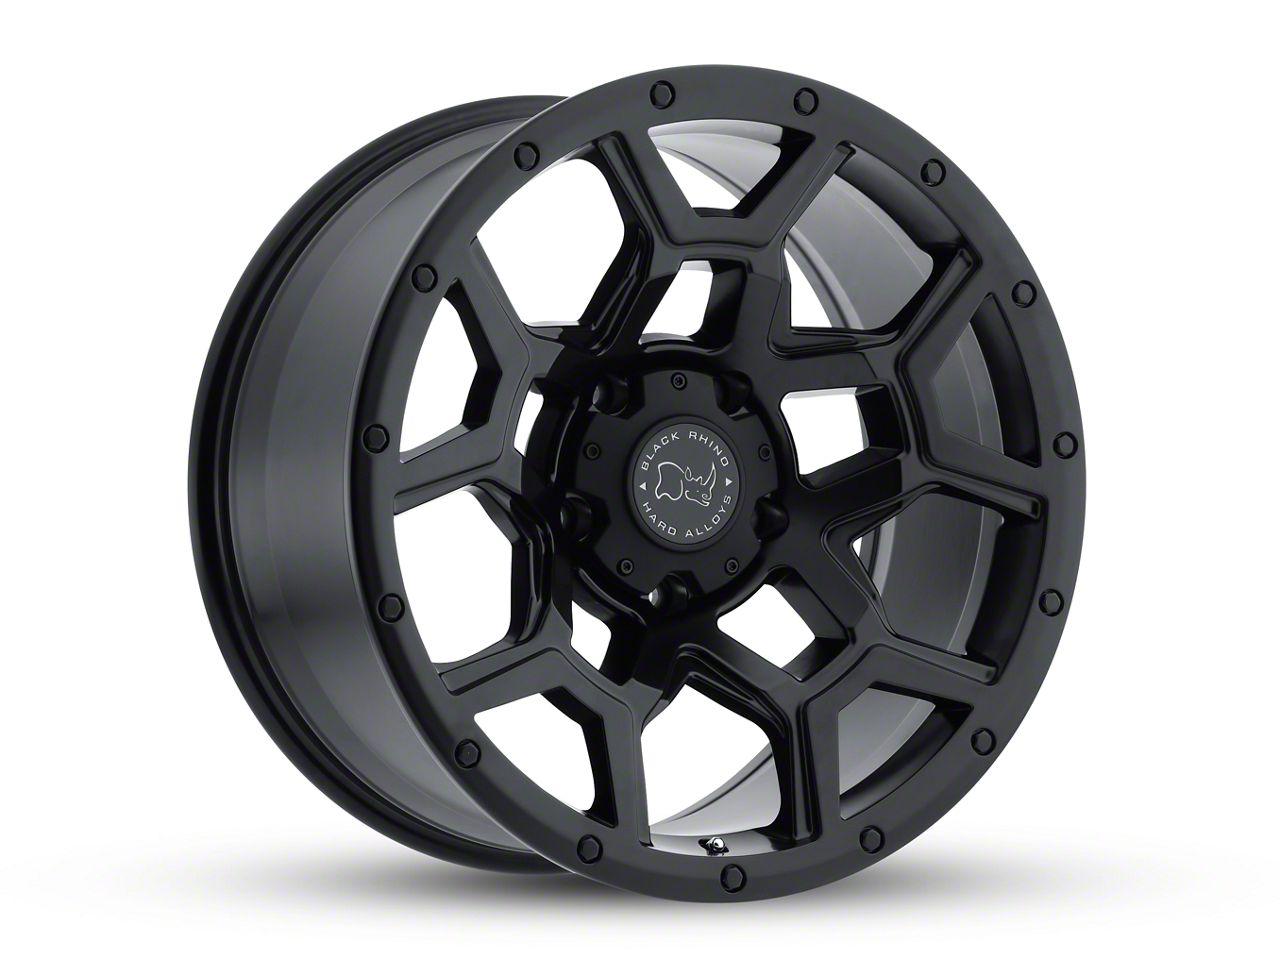 Black Rhino Overland Matte Black 6-Lug Wheel - 18x9.5 (07-18 Sierra 1500)